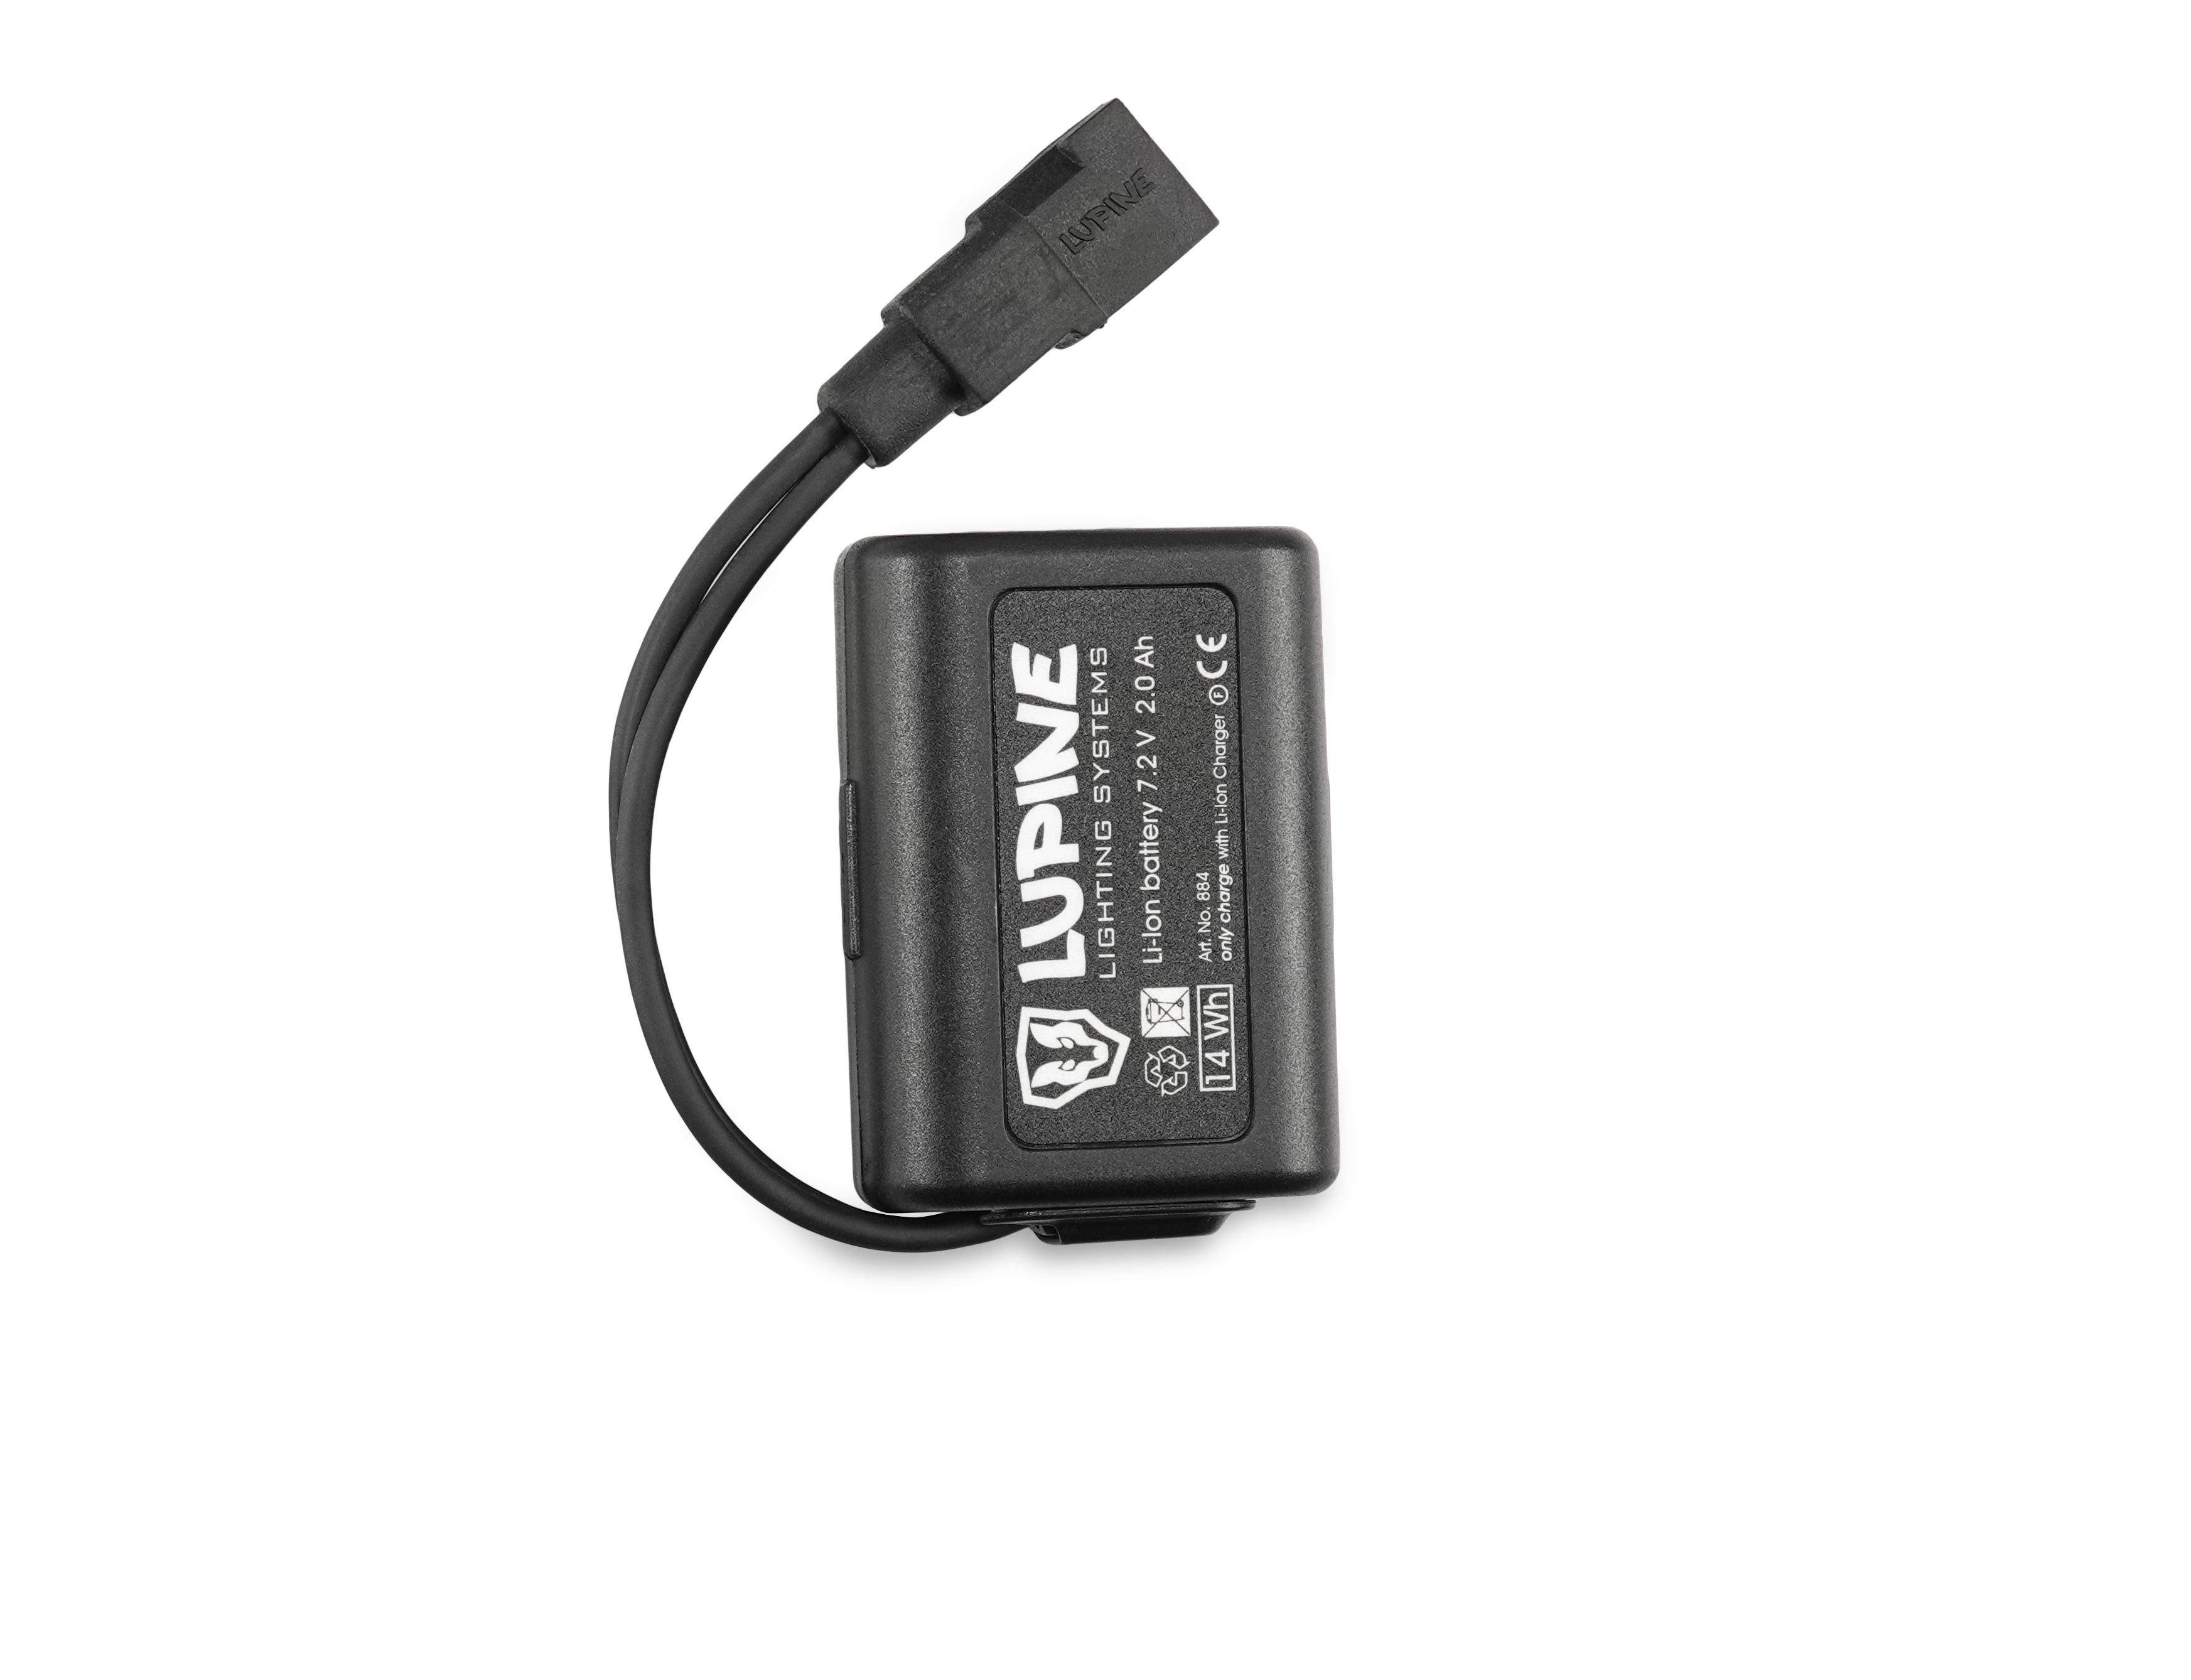 2.0 Ah Fastclick Battery